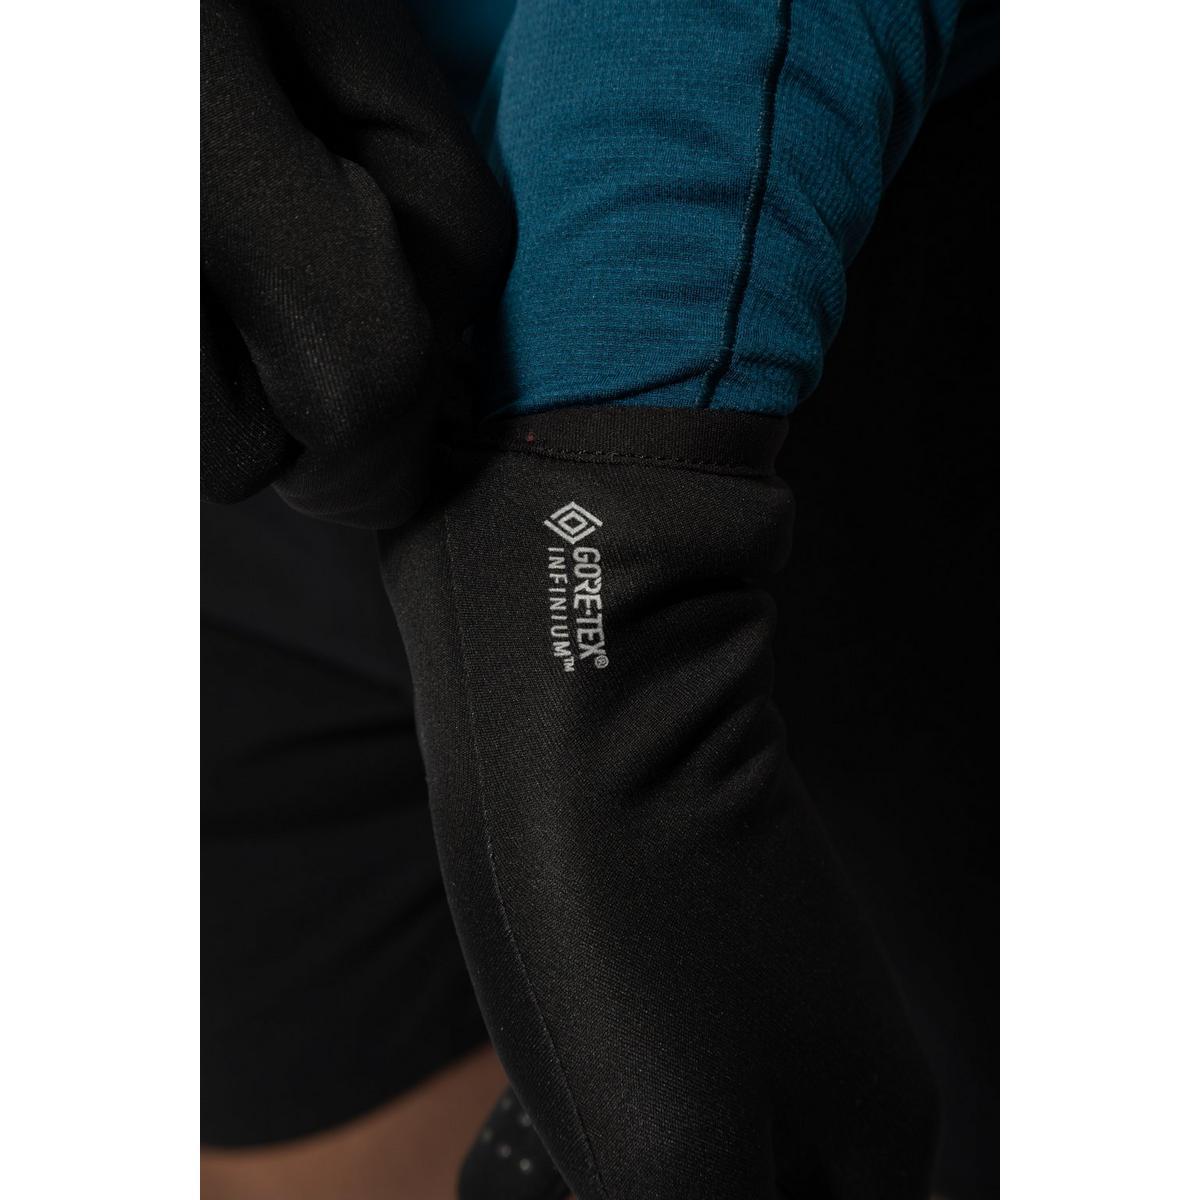 Montane Gloves Men's Via Groove Black/Shadow